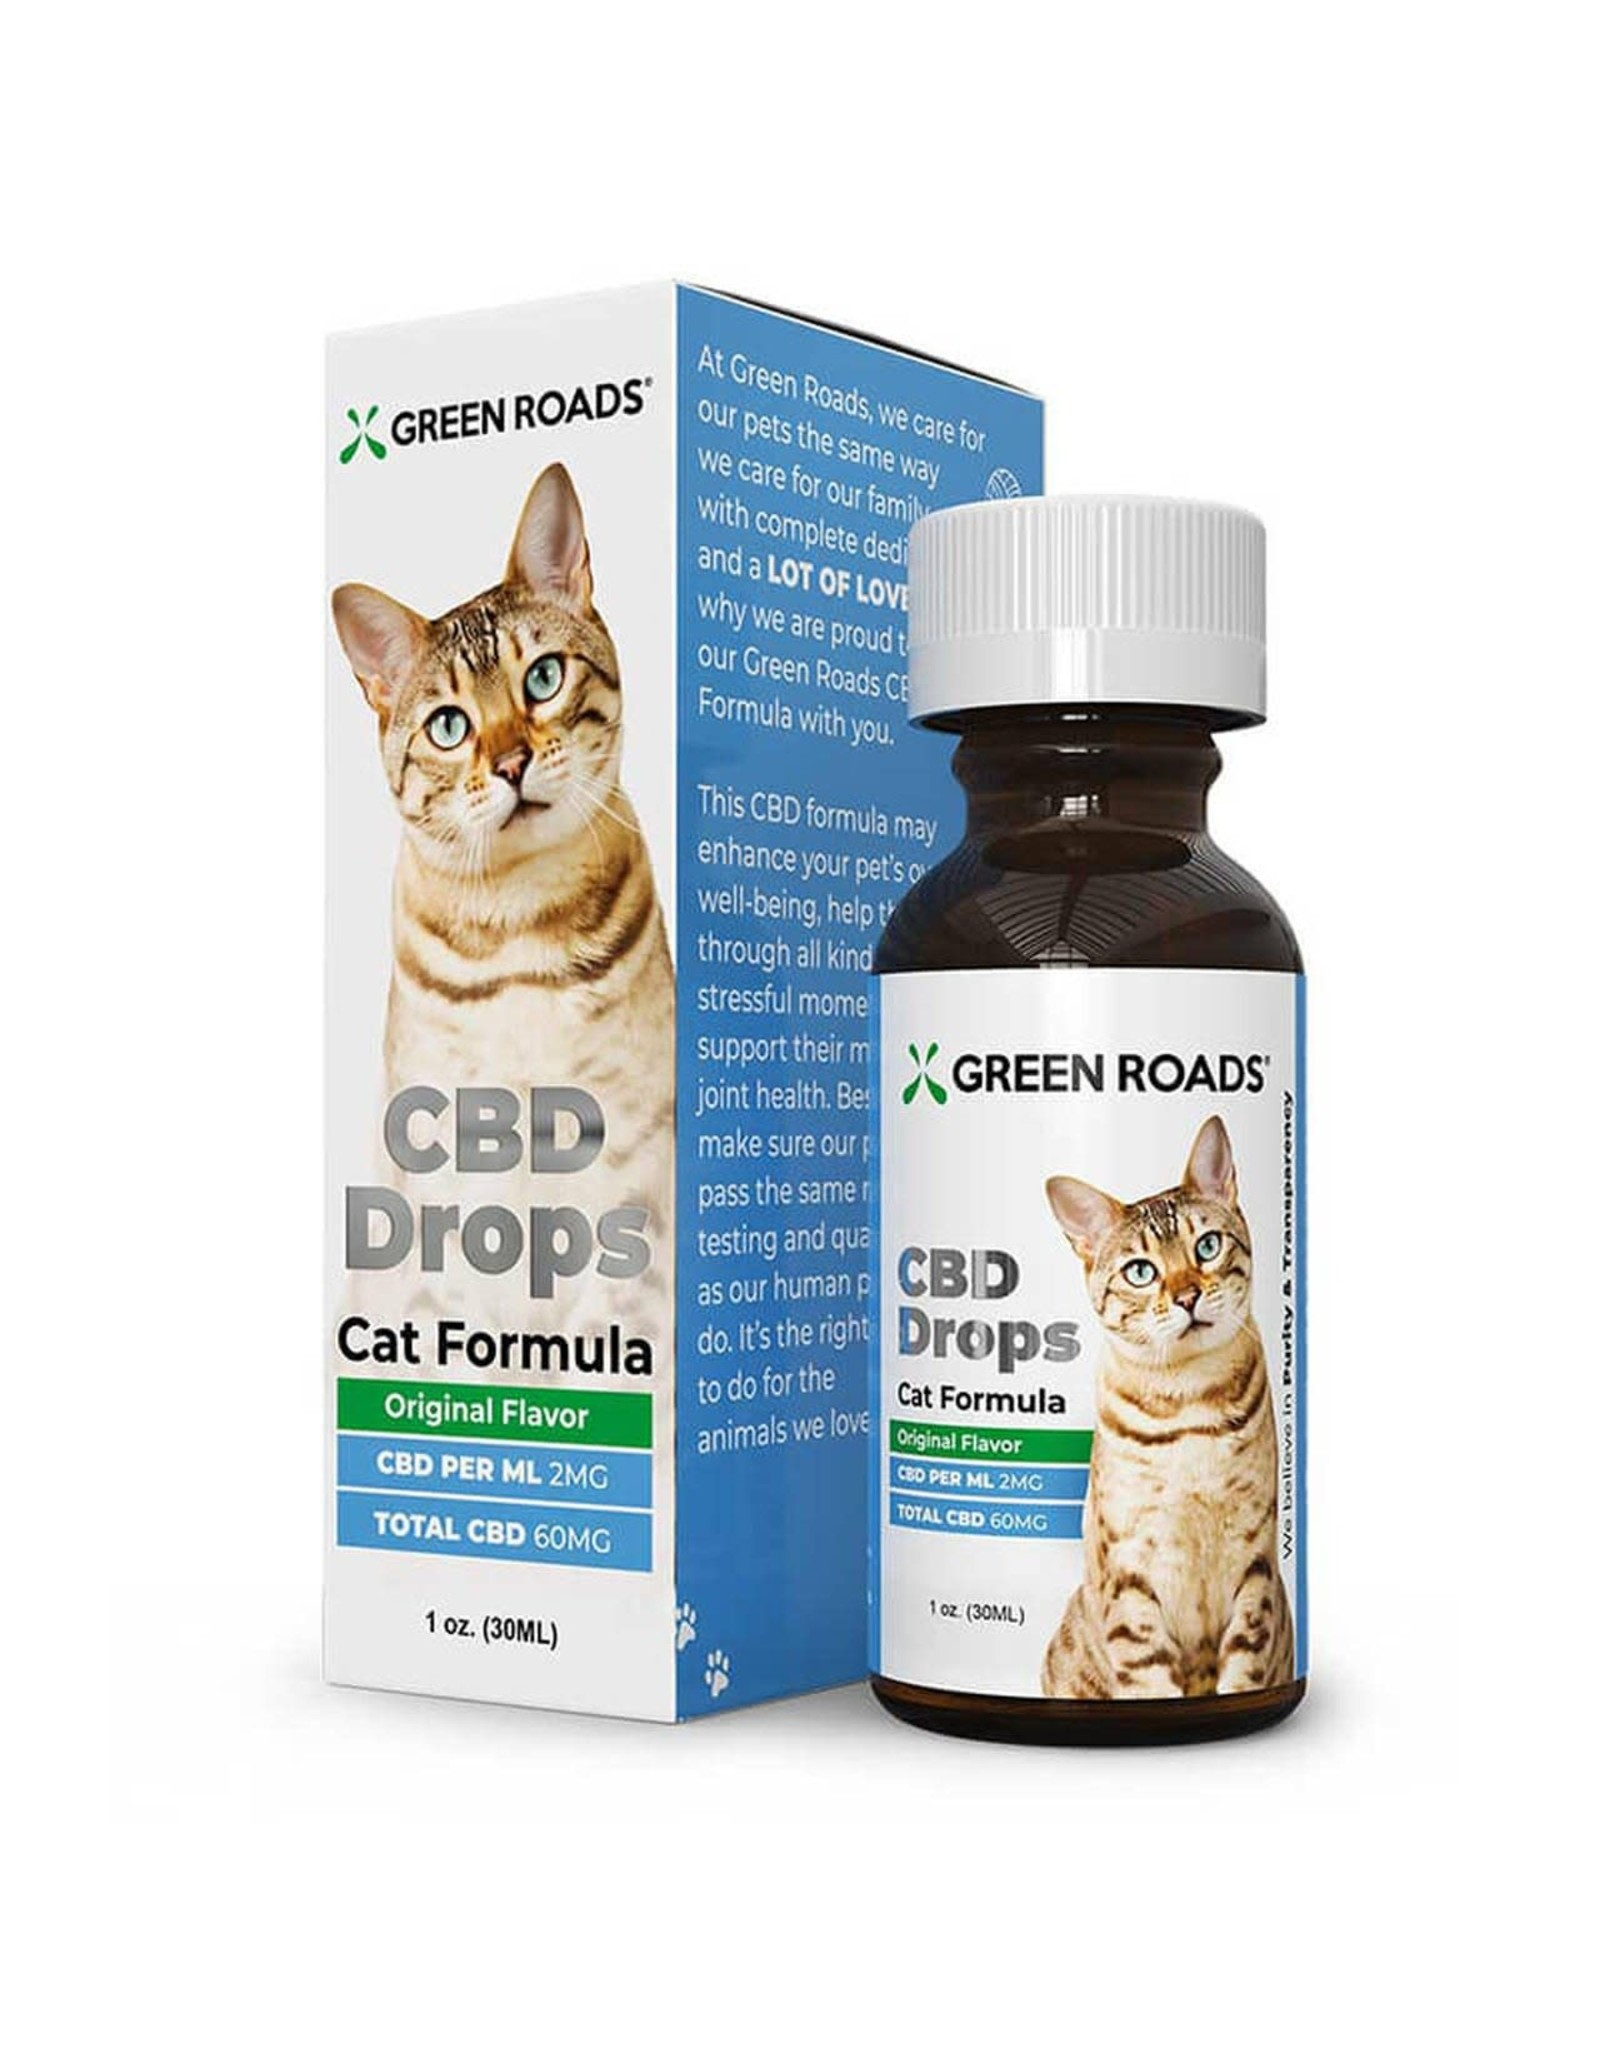 Green Roads Green Roads Tincture Cat Formula 60mg 1oz